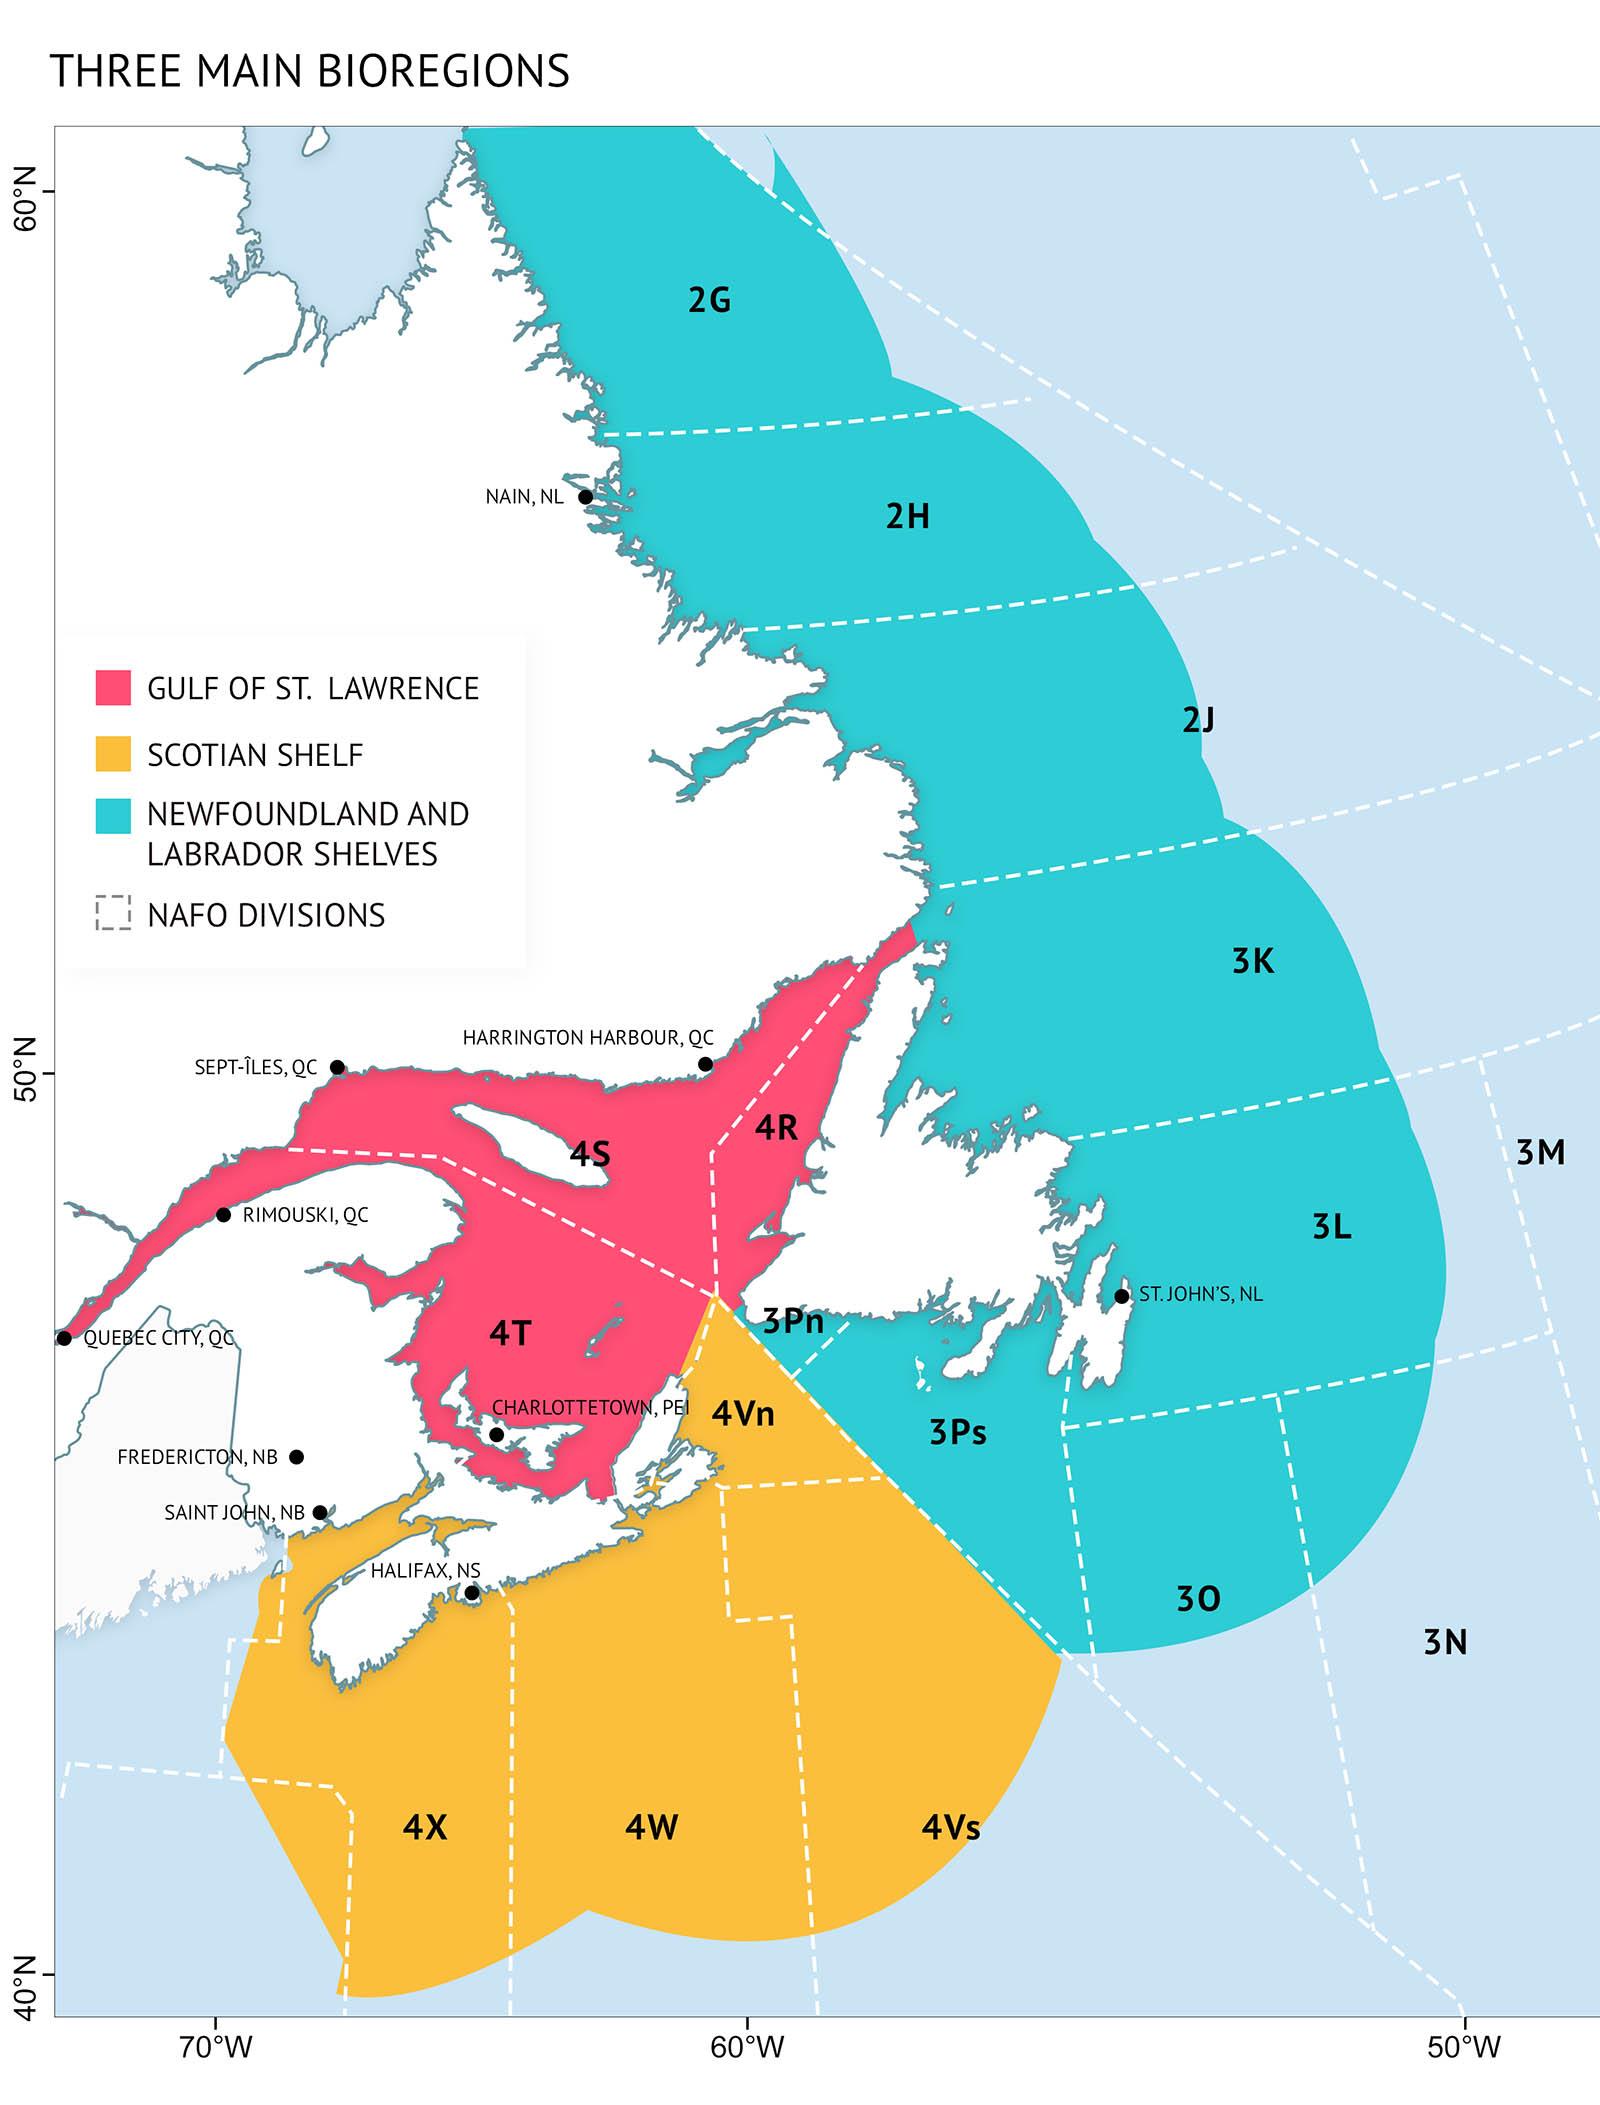 Canada's Oceans Now: Atlantic Ecosystems, 2018